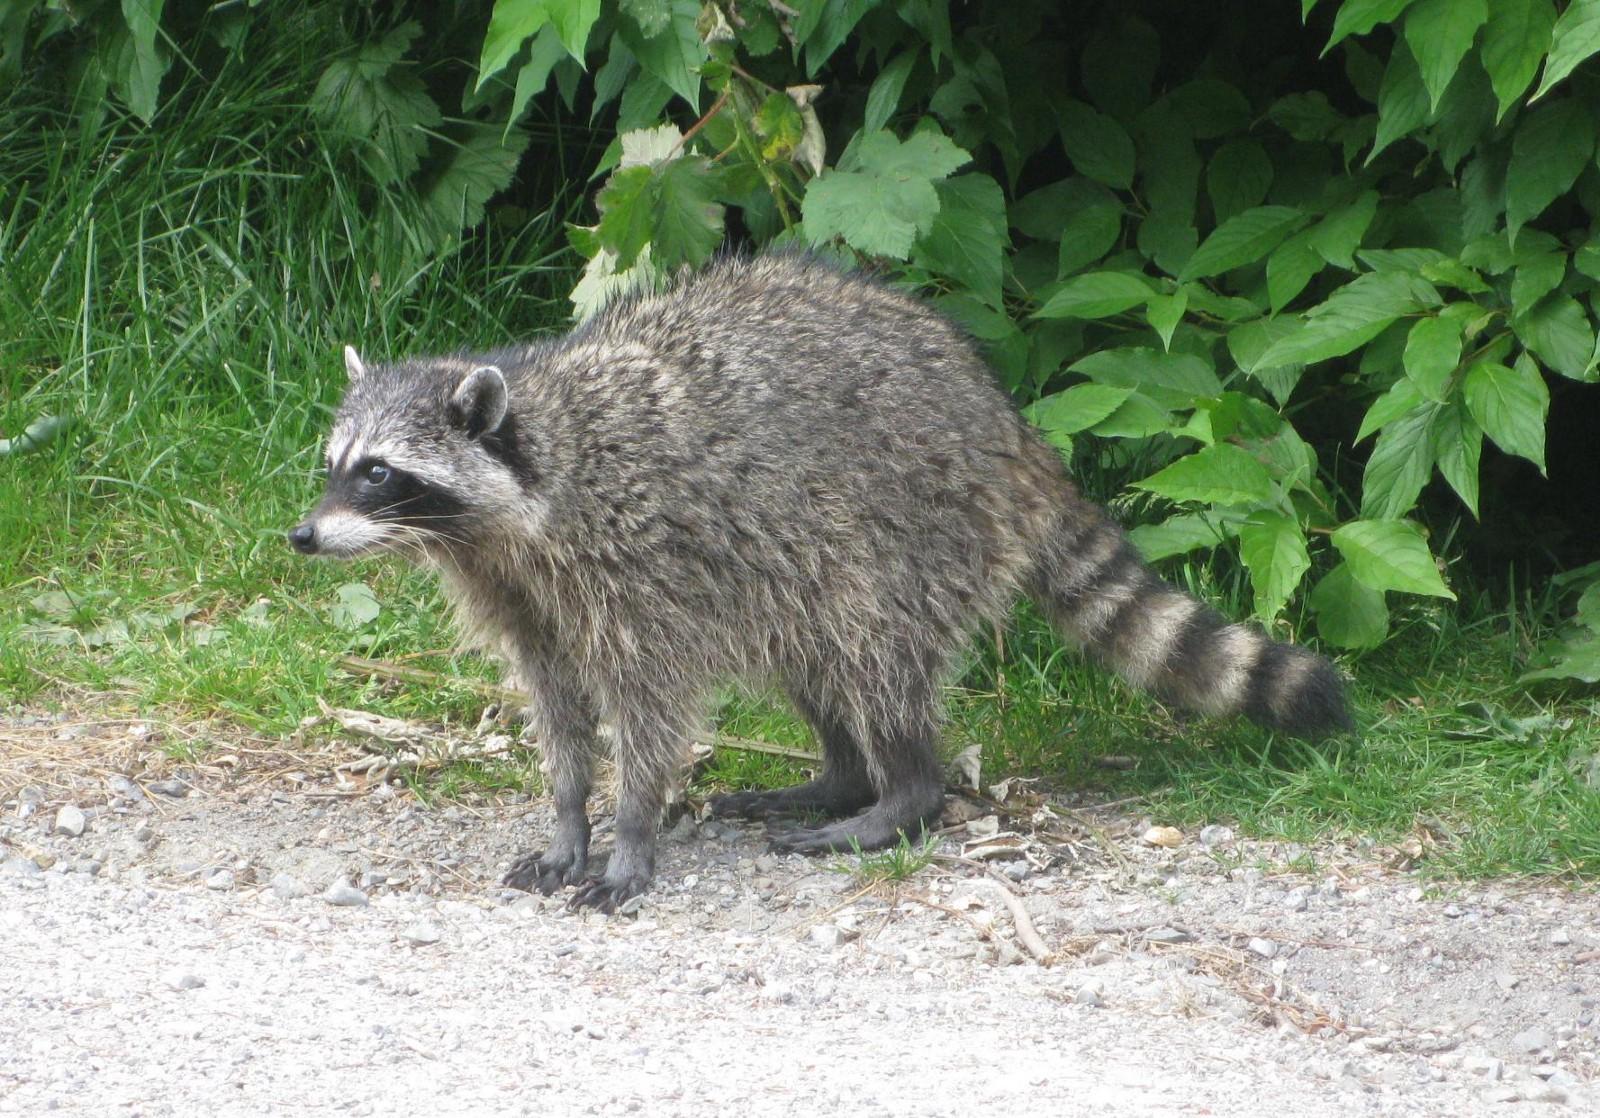 ODROID Magazine Figure 2 - A test image of a raccoon